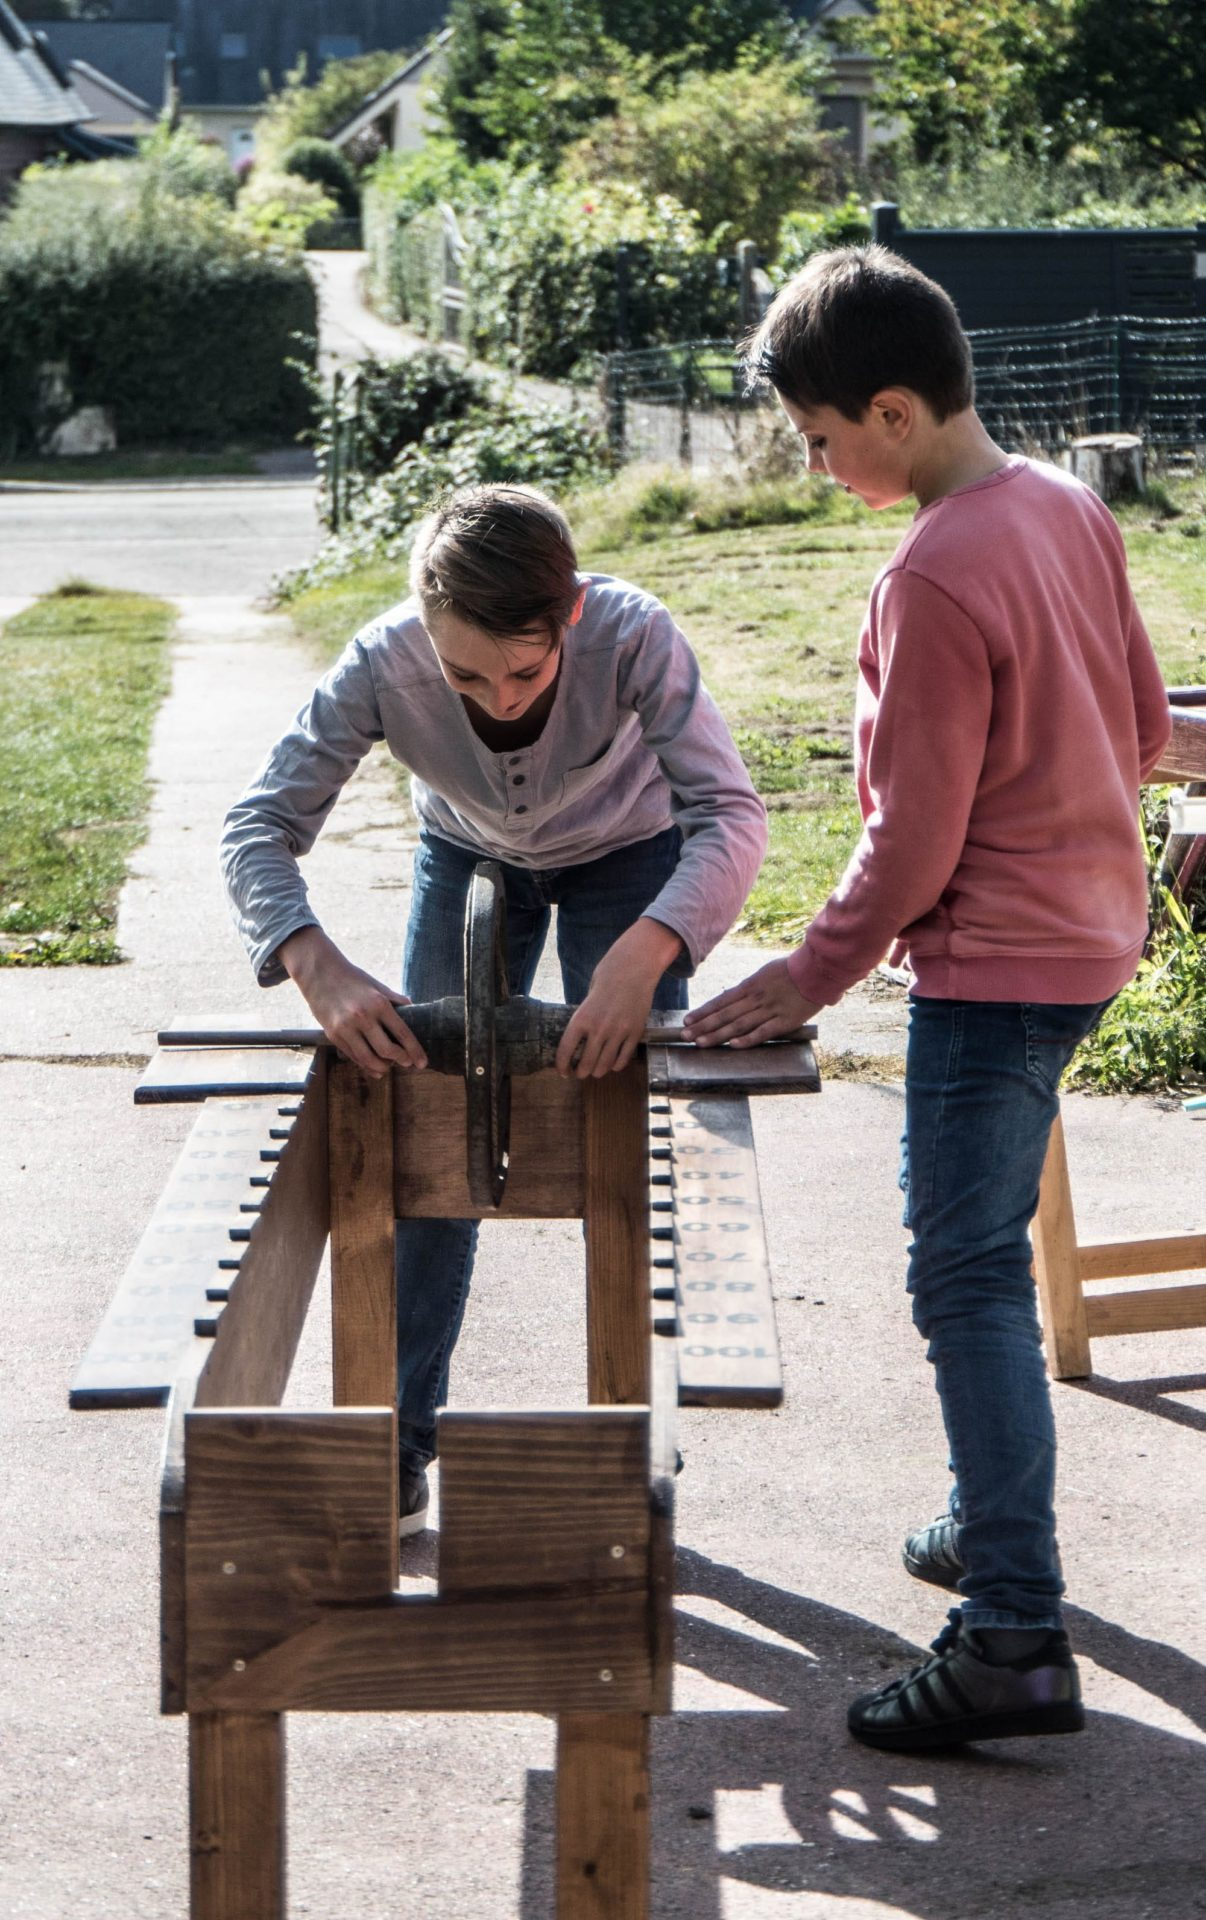 La meule jeu en bois traditionnel d'adresse